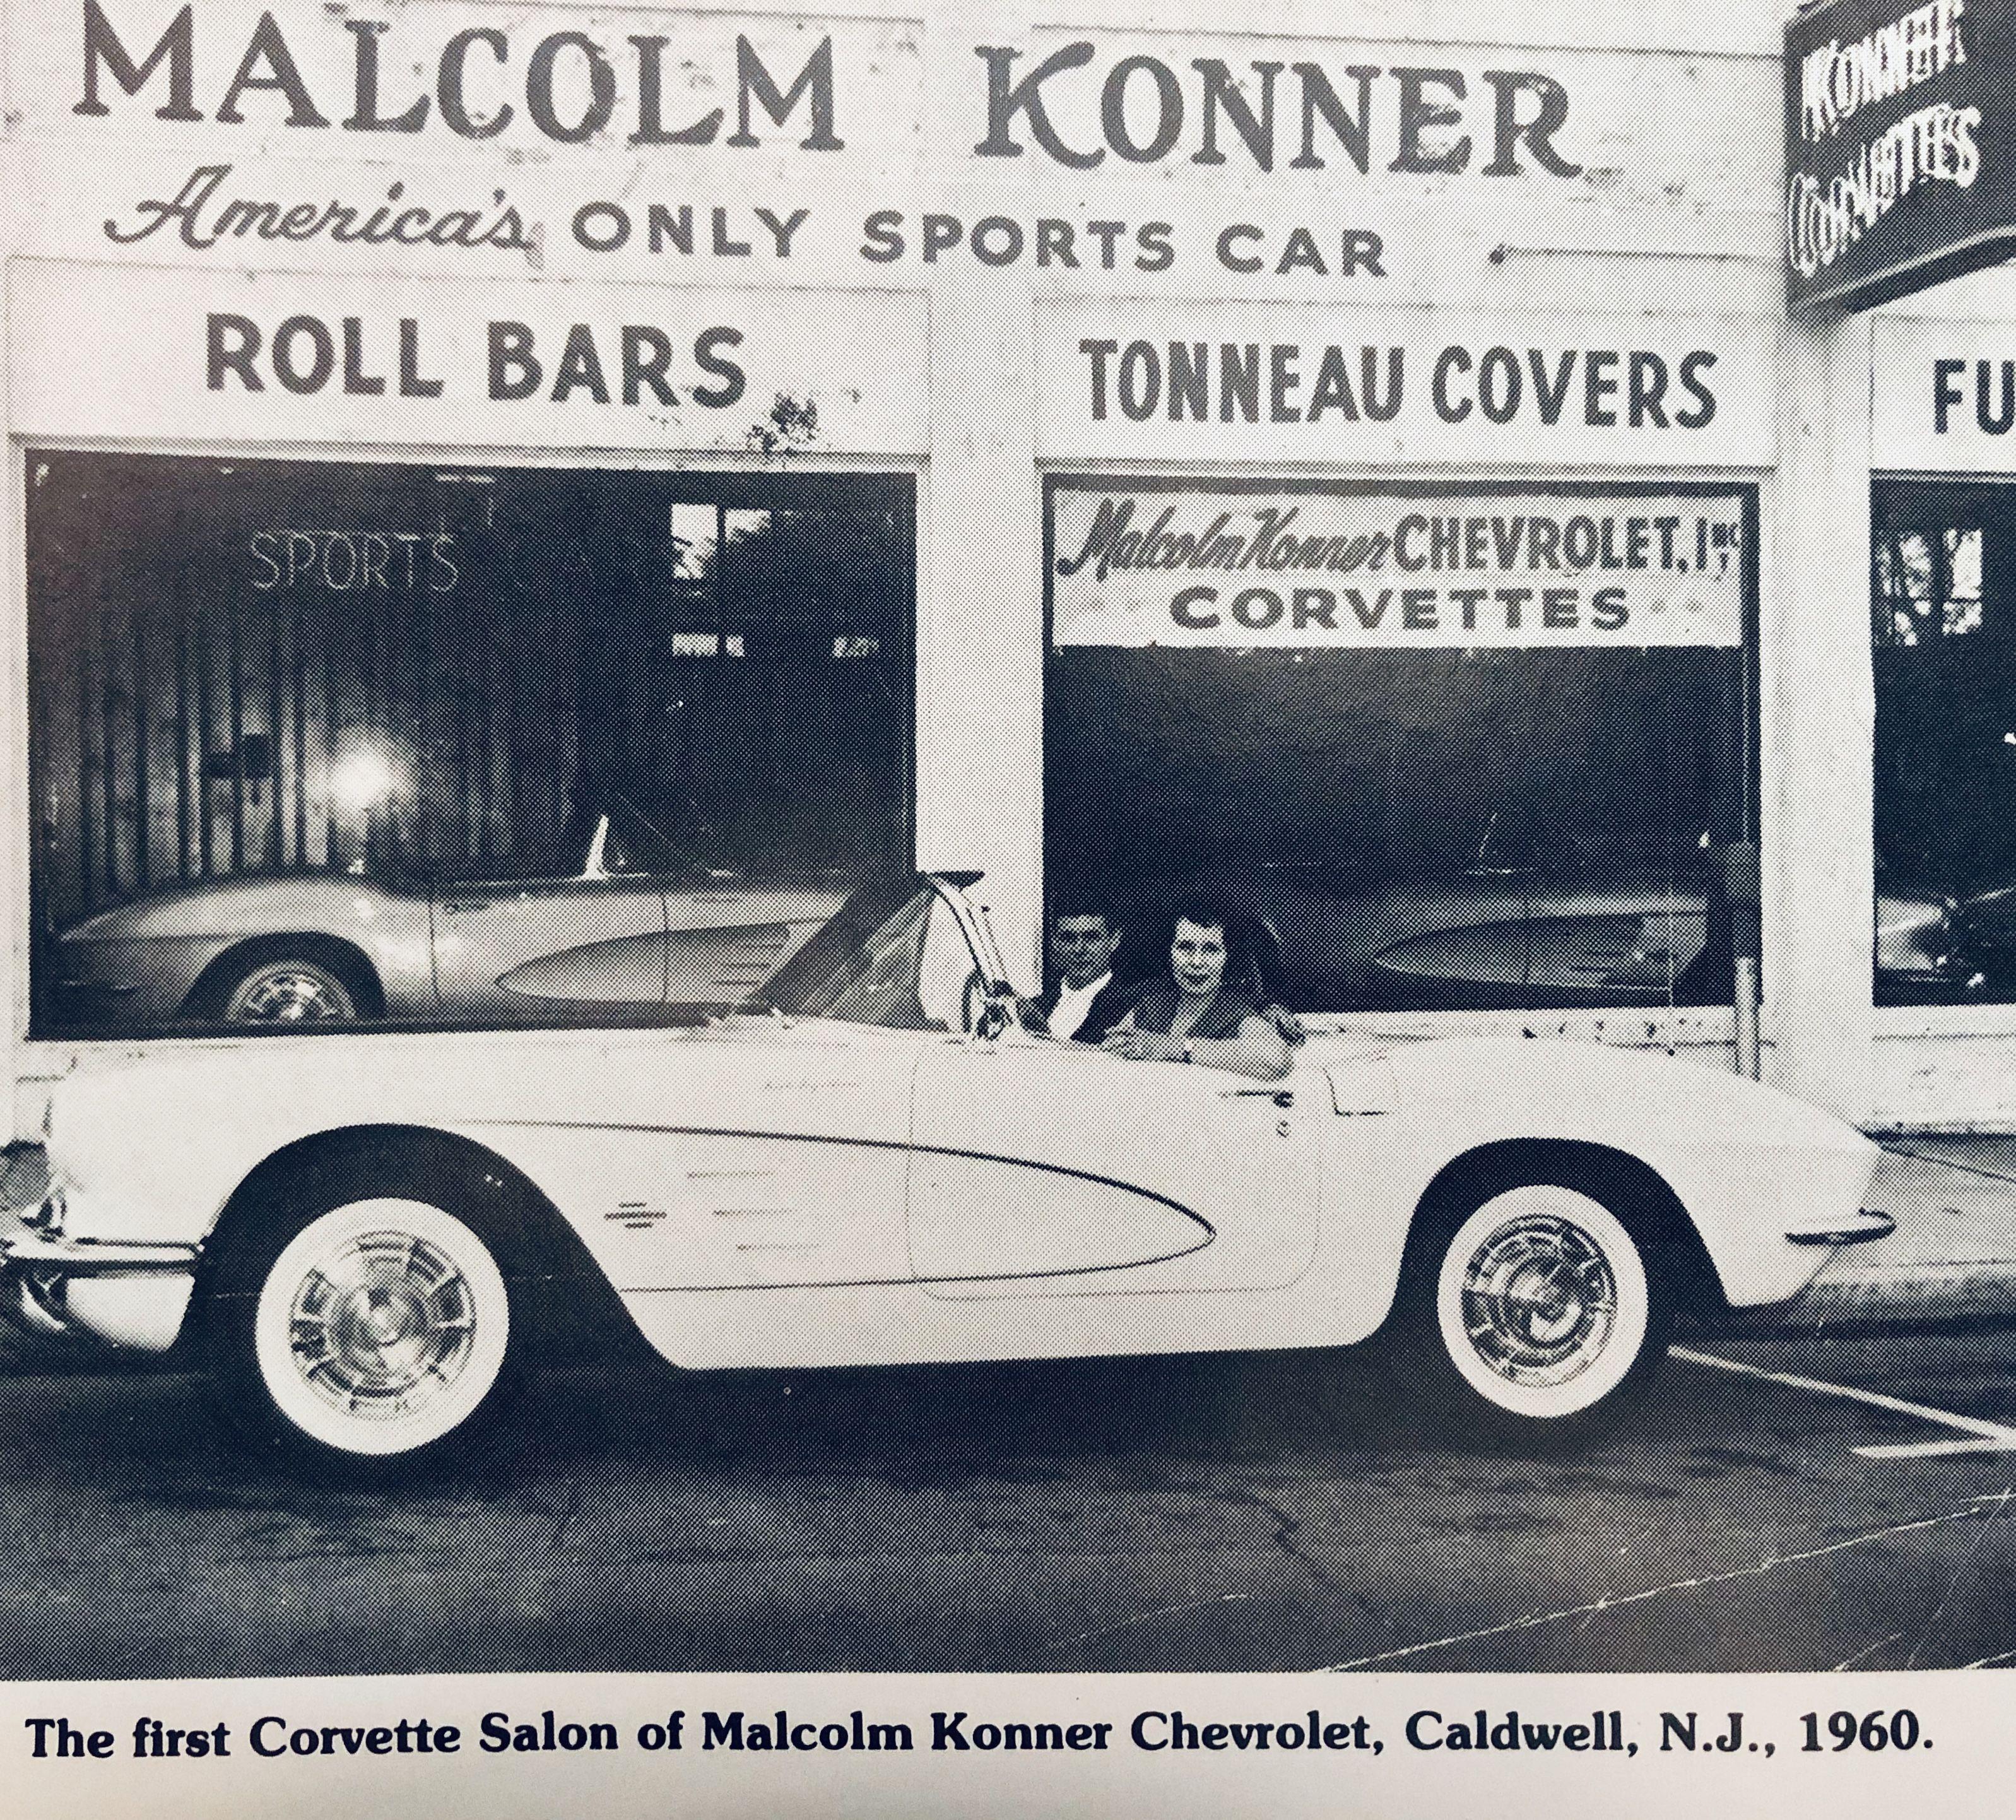 Malcolm Konner Sports Car Salon Circa 1961 Corvette Tonneau Cover Sports Car